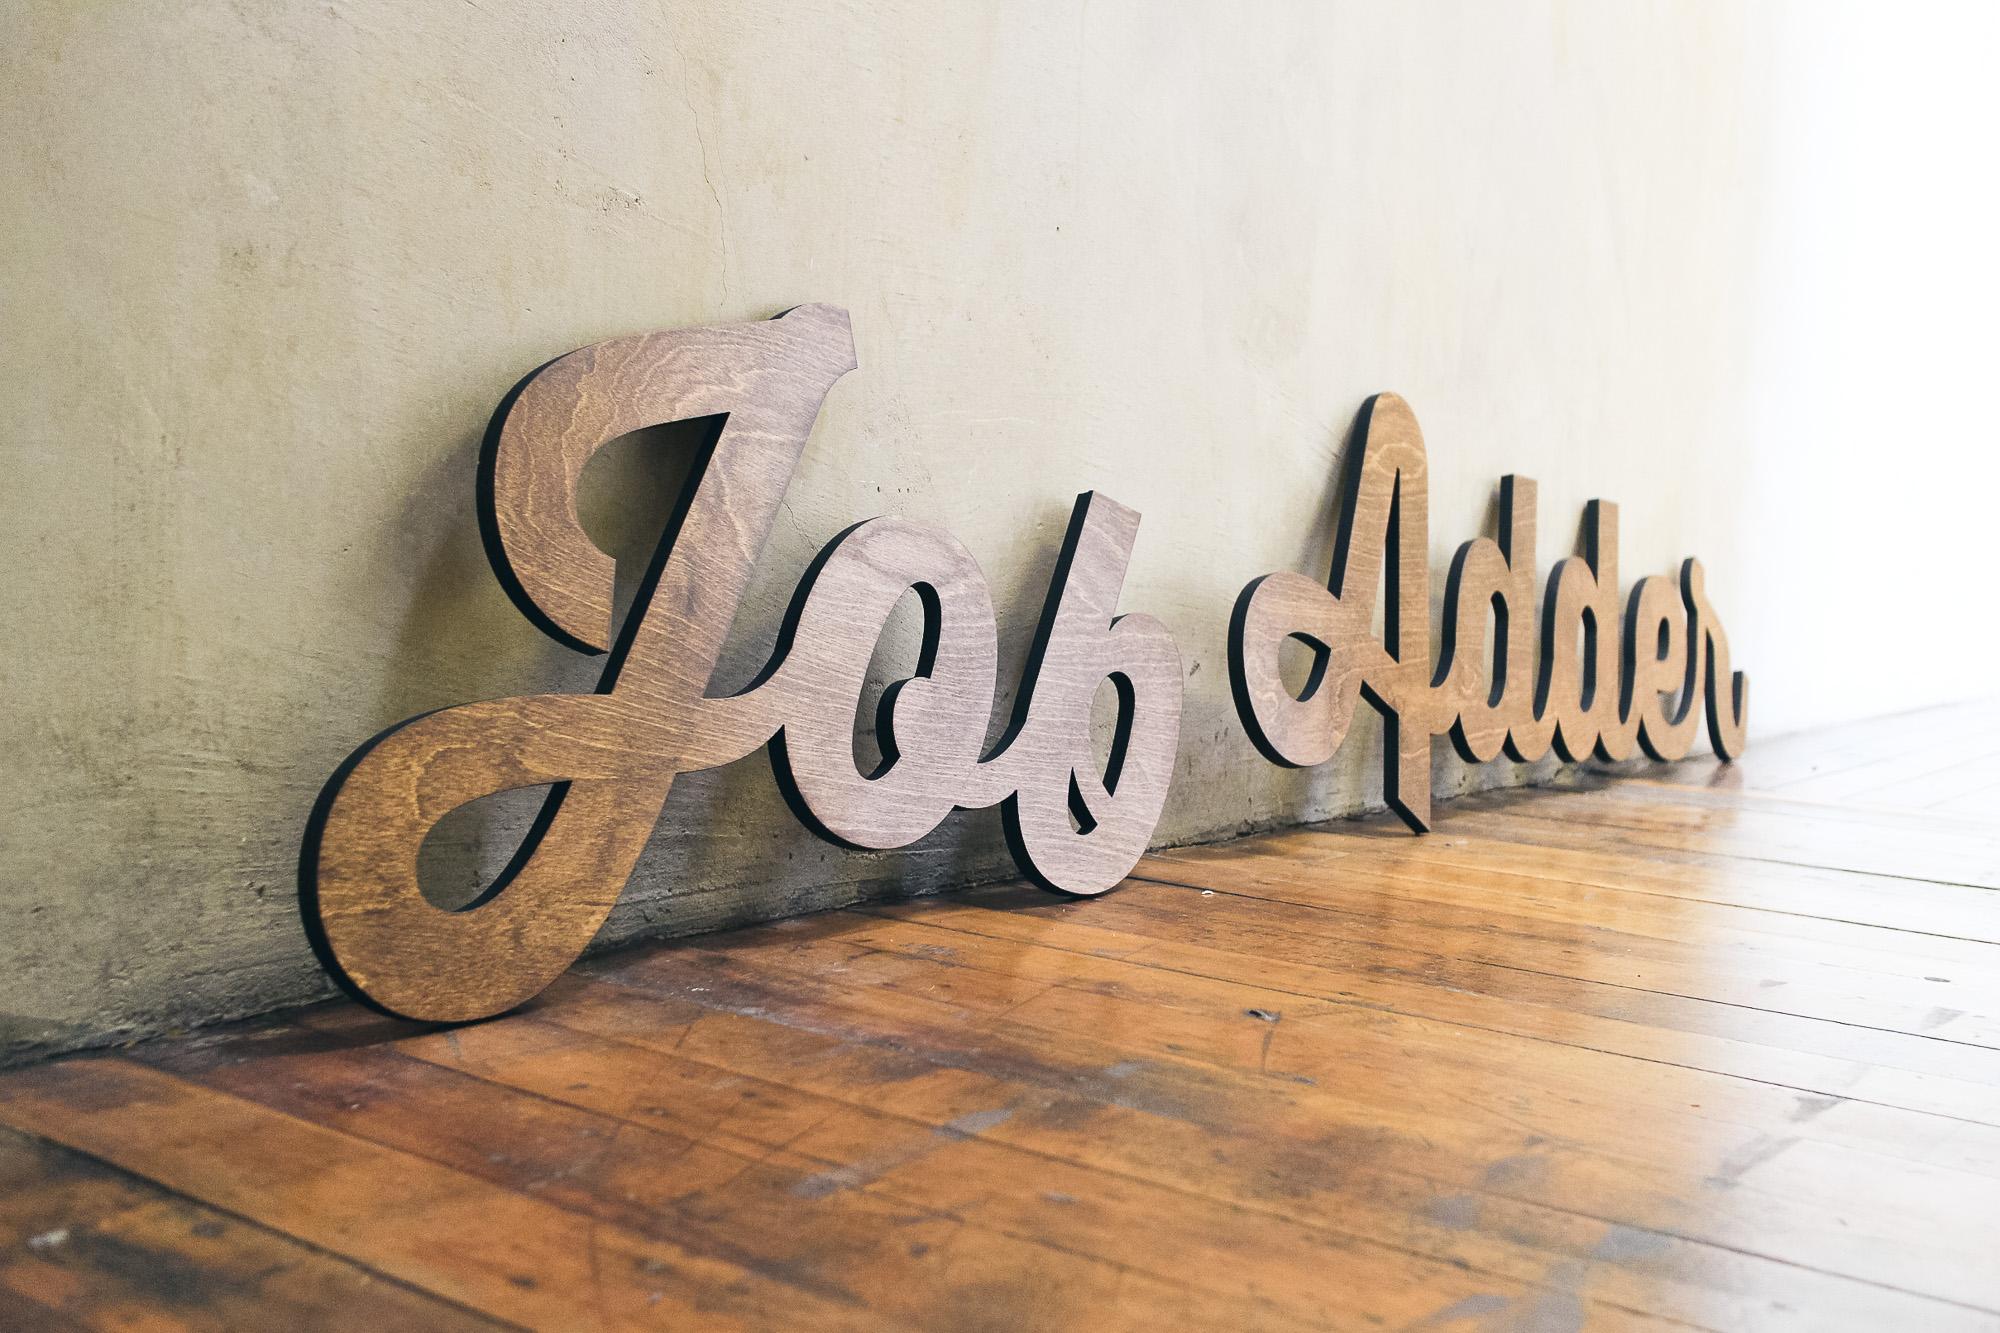 Cutout Wood Signage for JobAdder